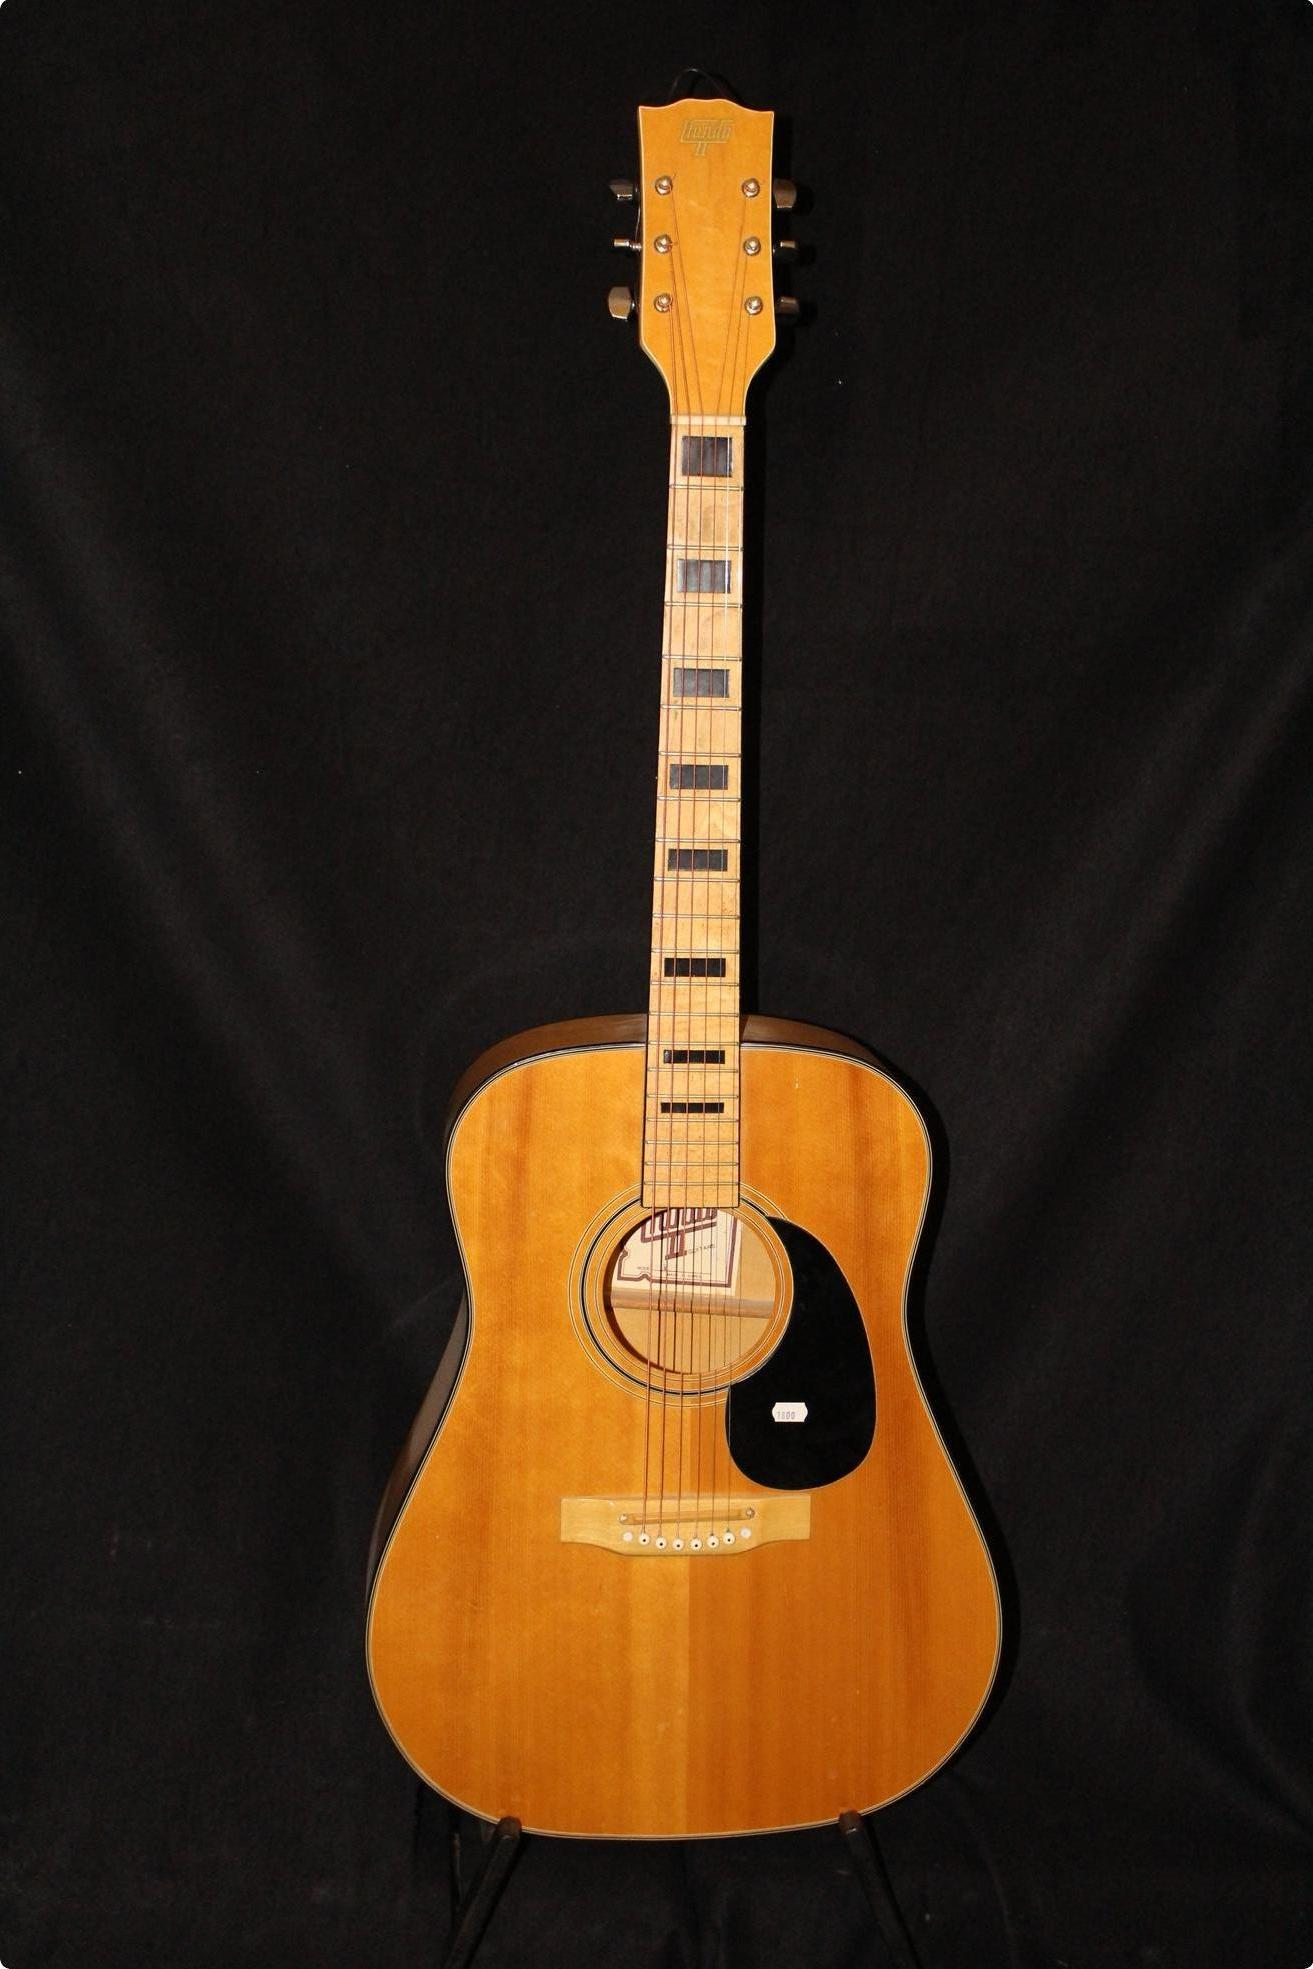 Hondo II FJ260A 1990s Natural Guitar For Sale Twang